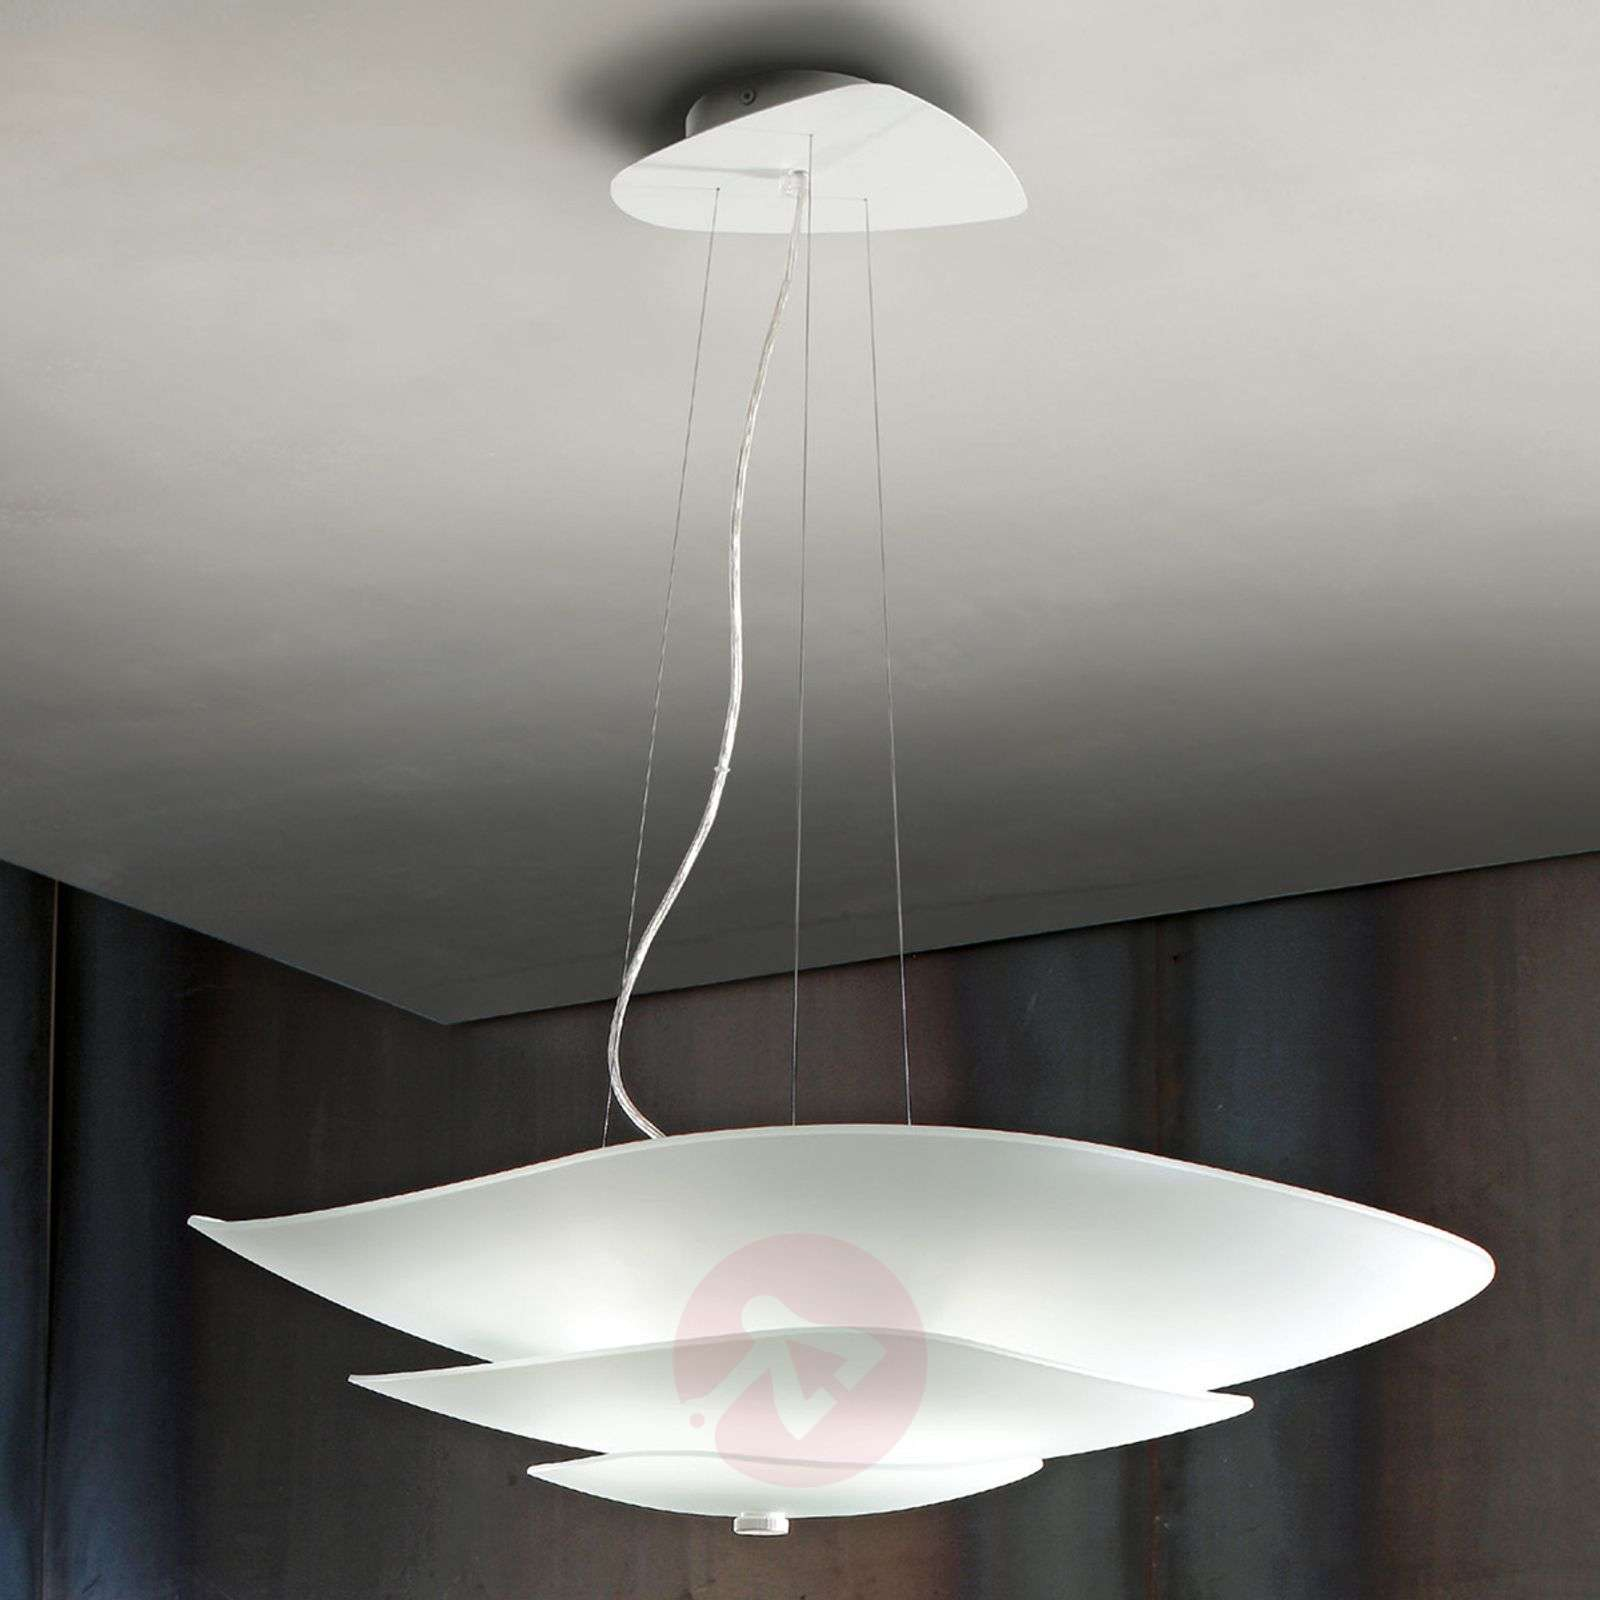 Fantastical Moledro hanging light-6042304-05